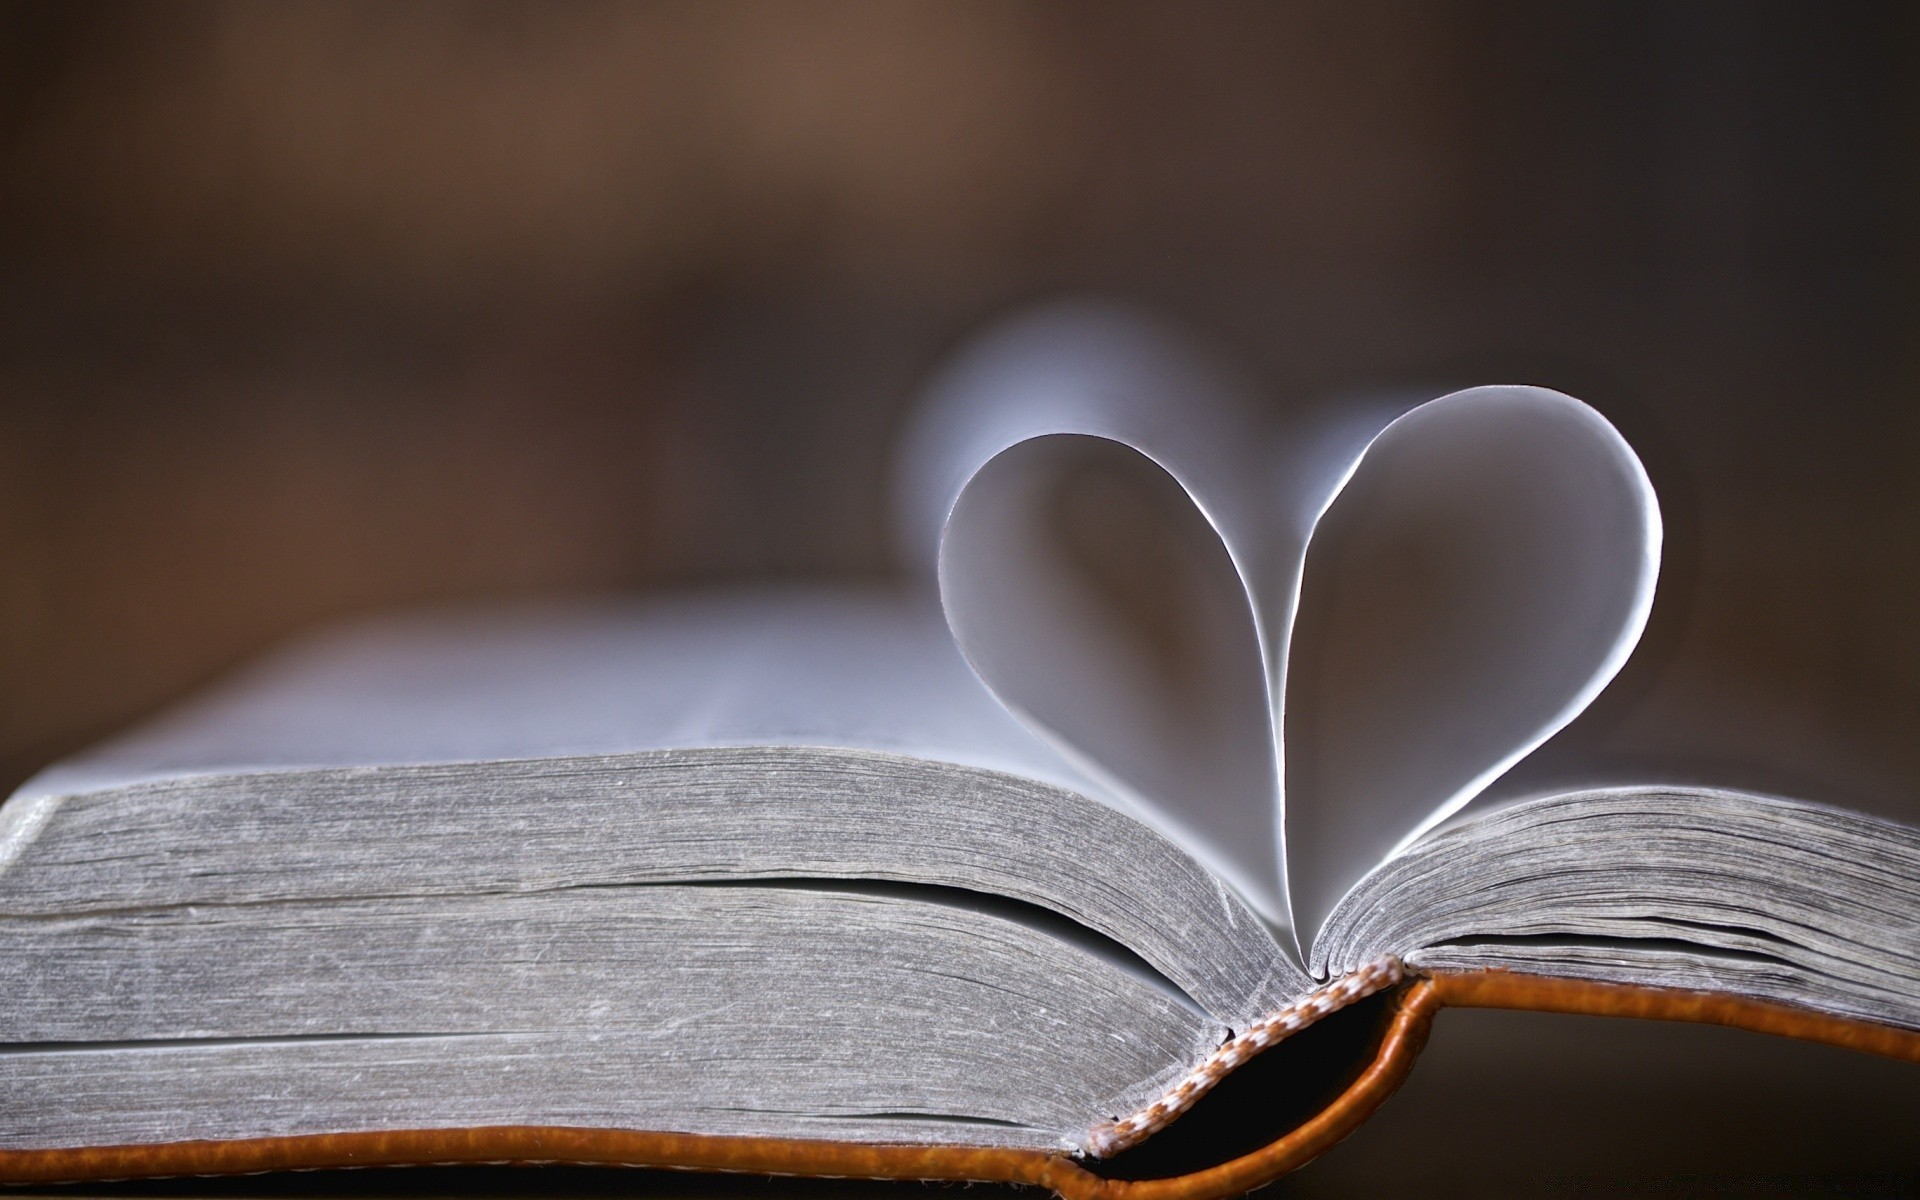 Картинки с сердечками и книгой